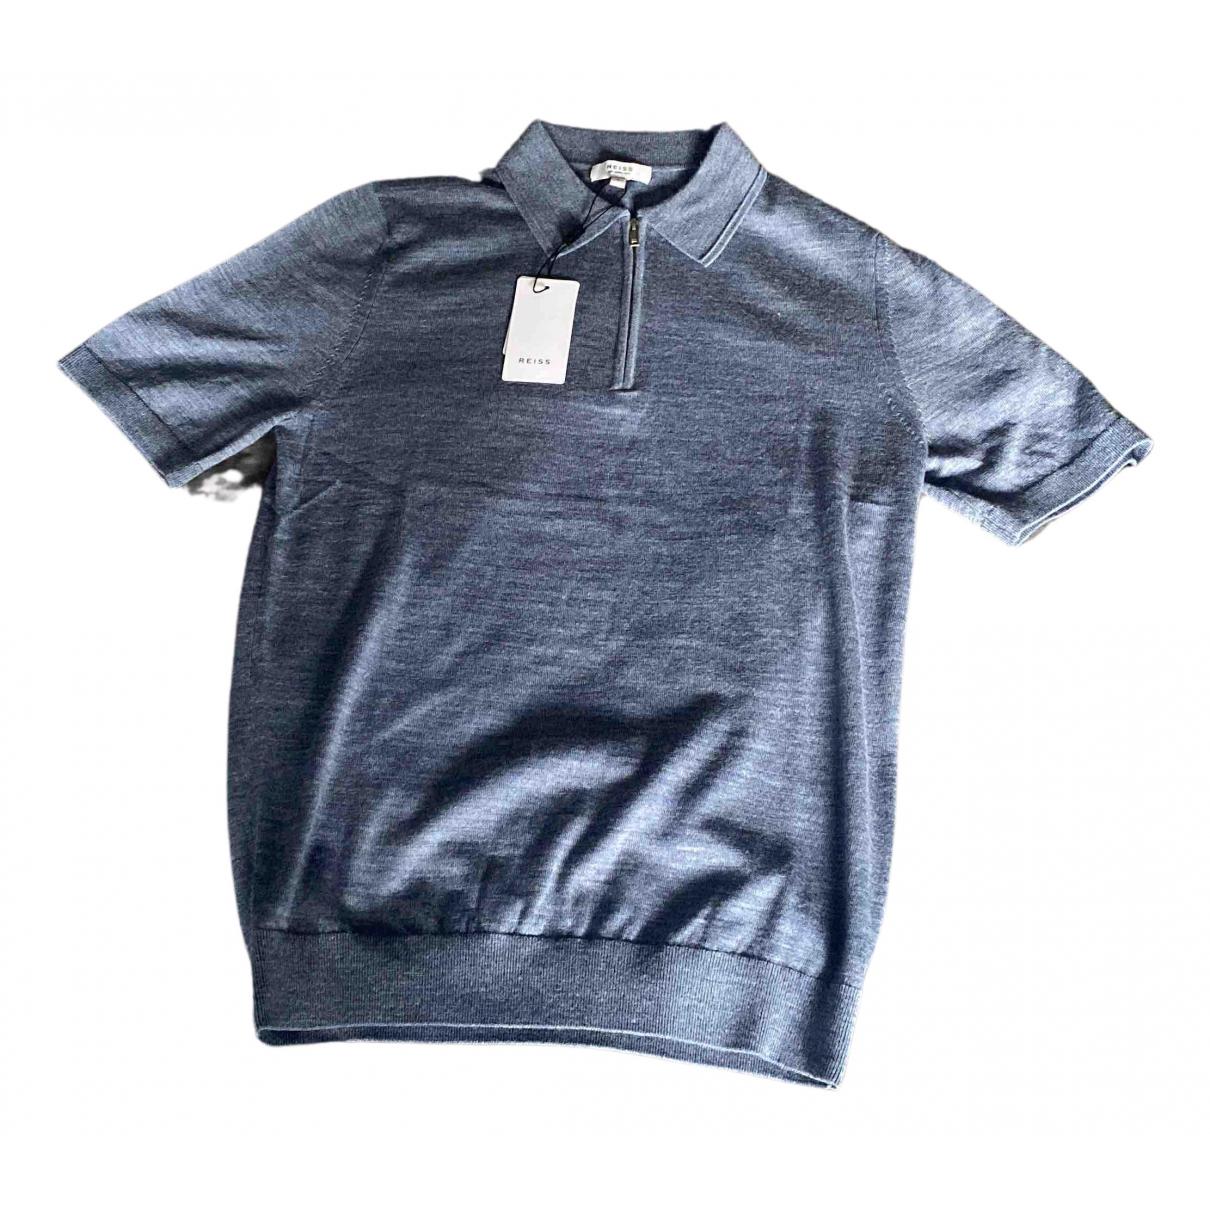 Reiss - Polos   pour homme en coton - bleu